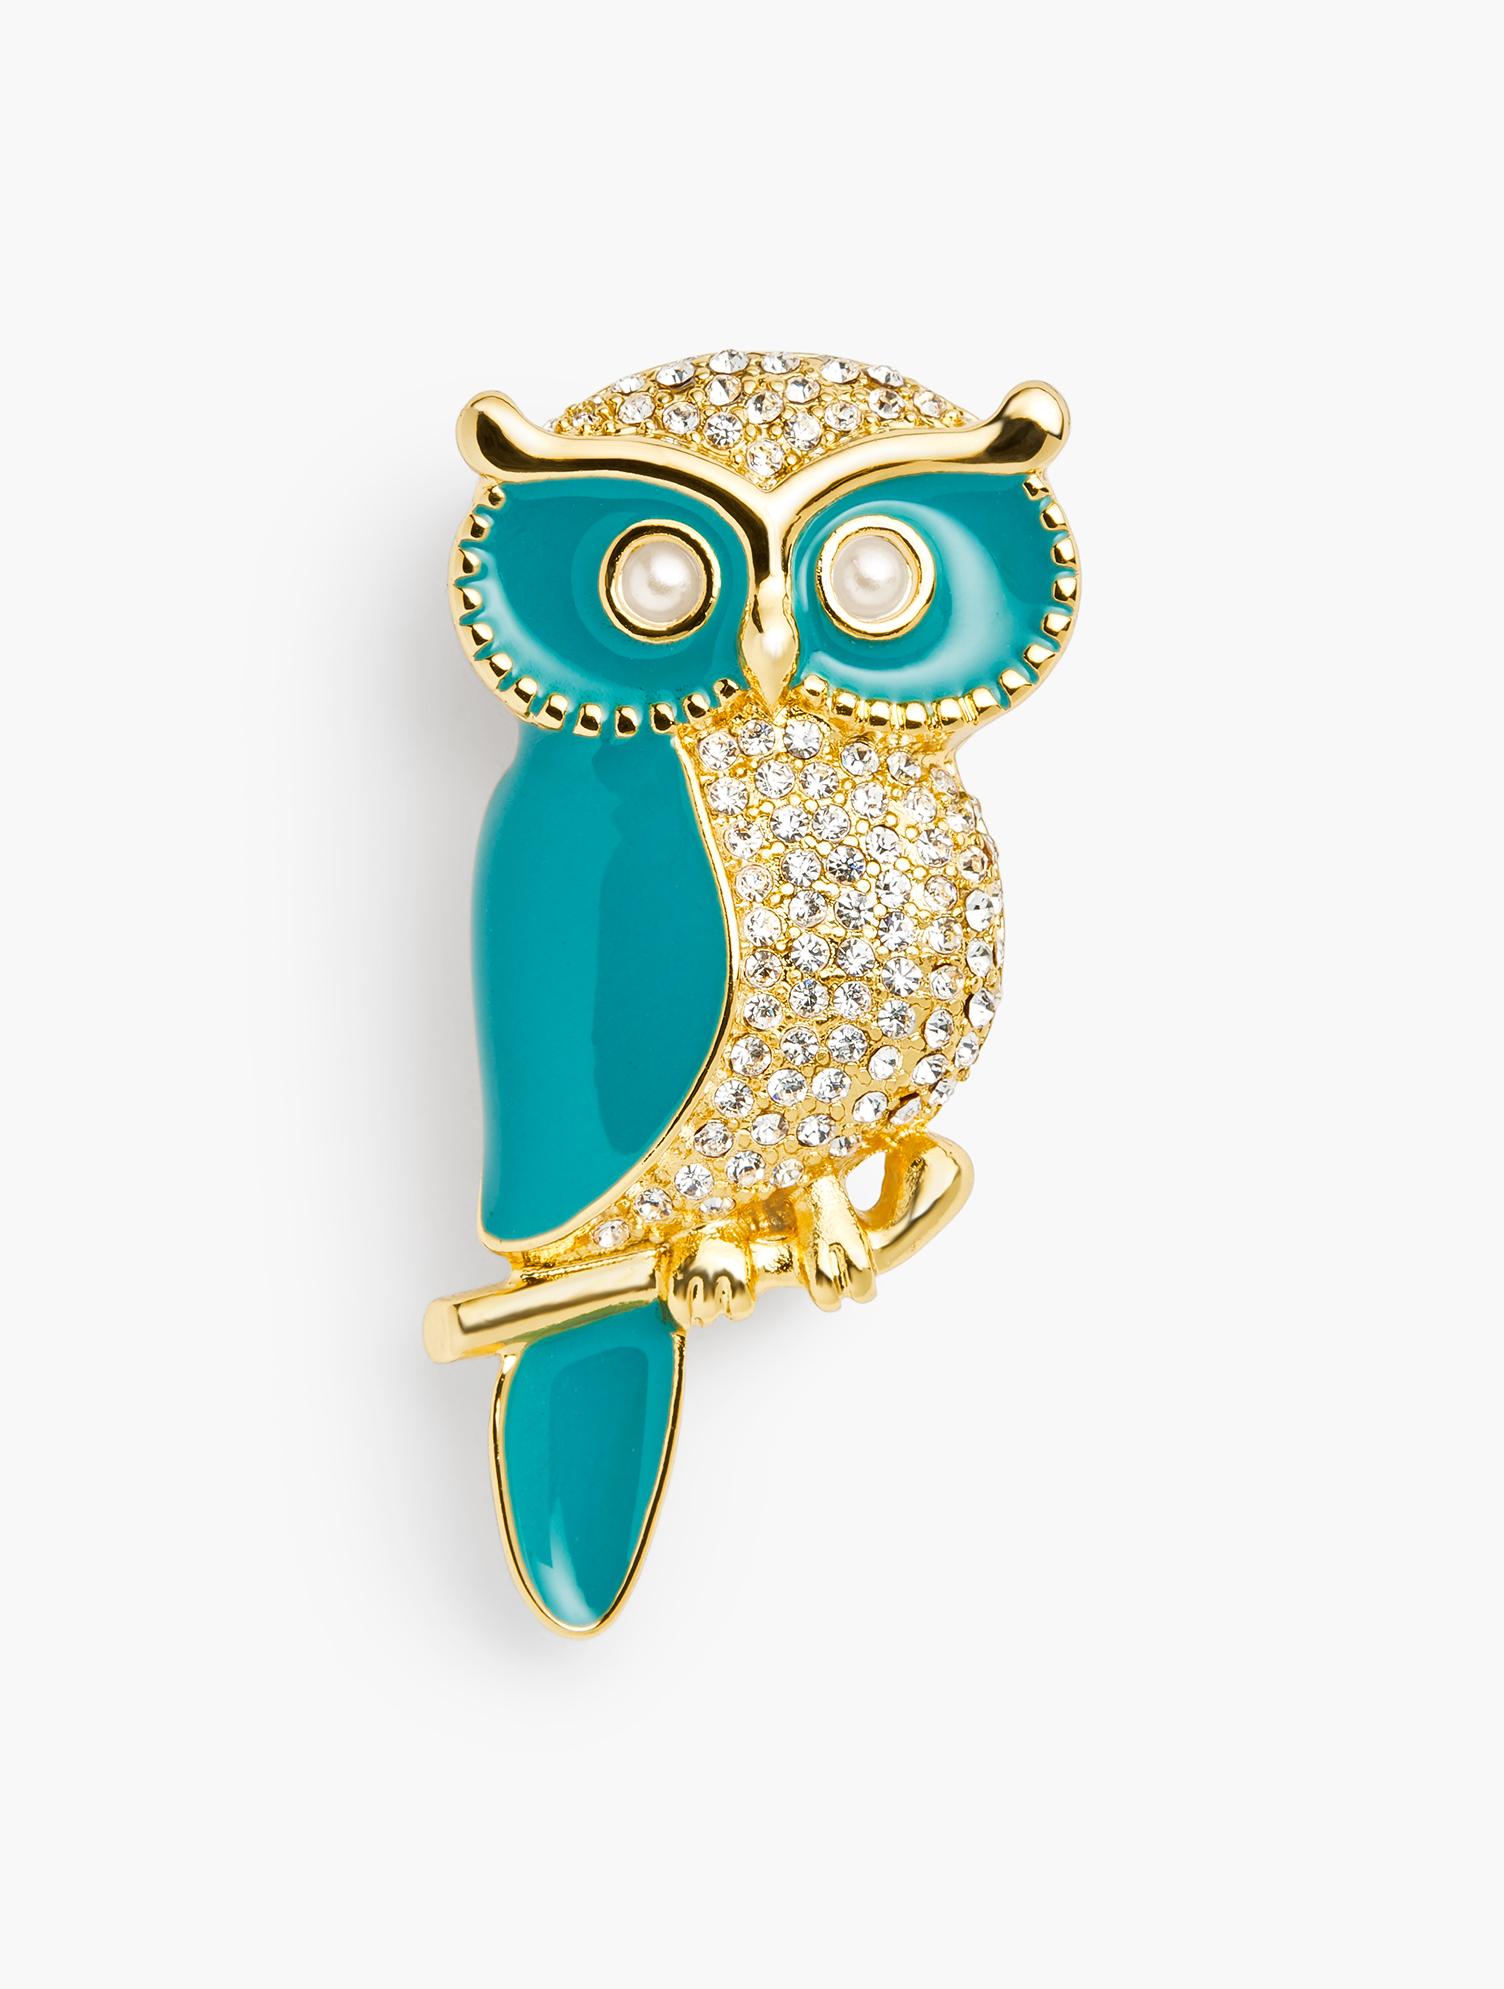 50s Jewelry: Earrings, Necklace, Brooch, Bracelet Enamel Owl Brooch - TEAL-BLUEGOLD - OS - Talbots $39.99 AT vintagedancer.com